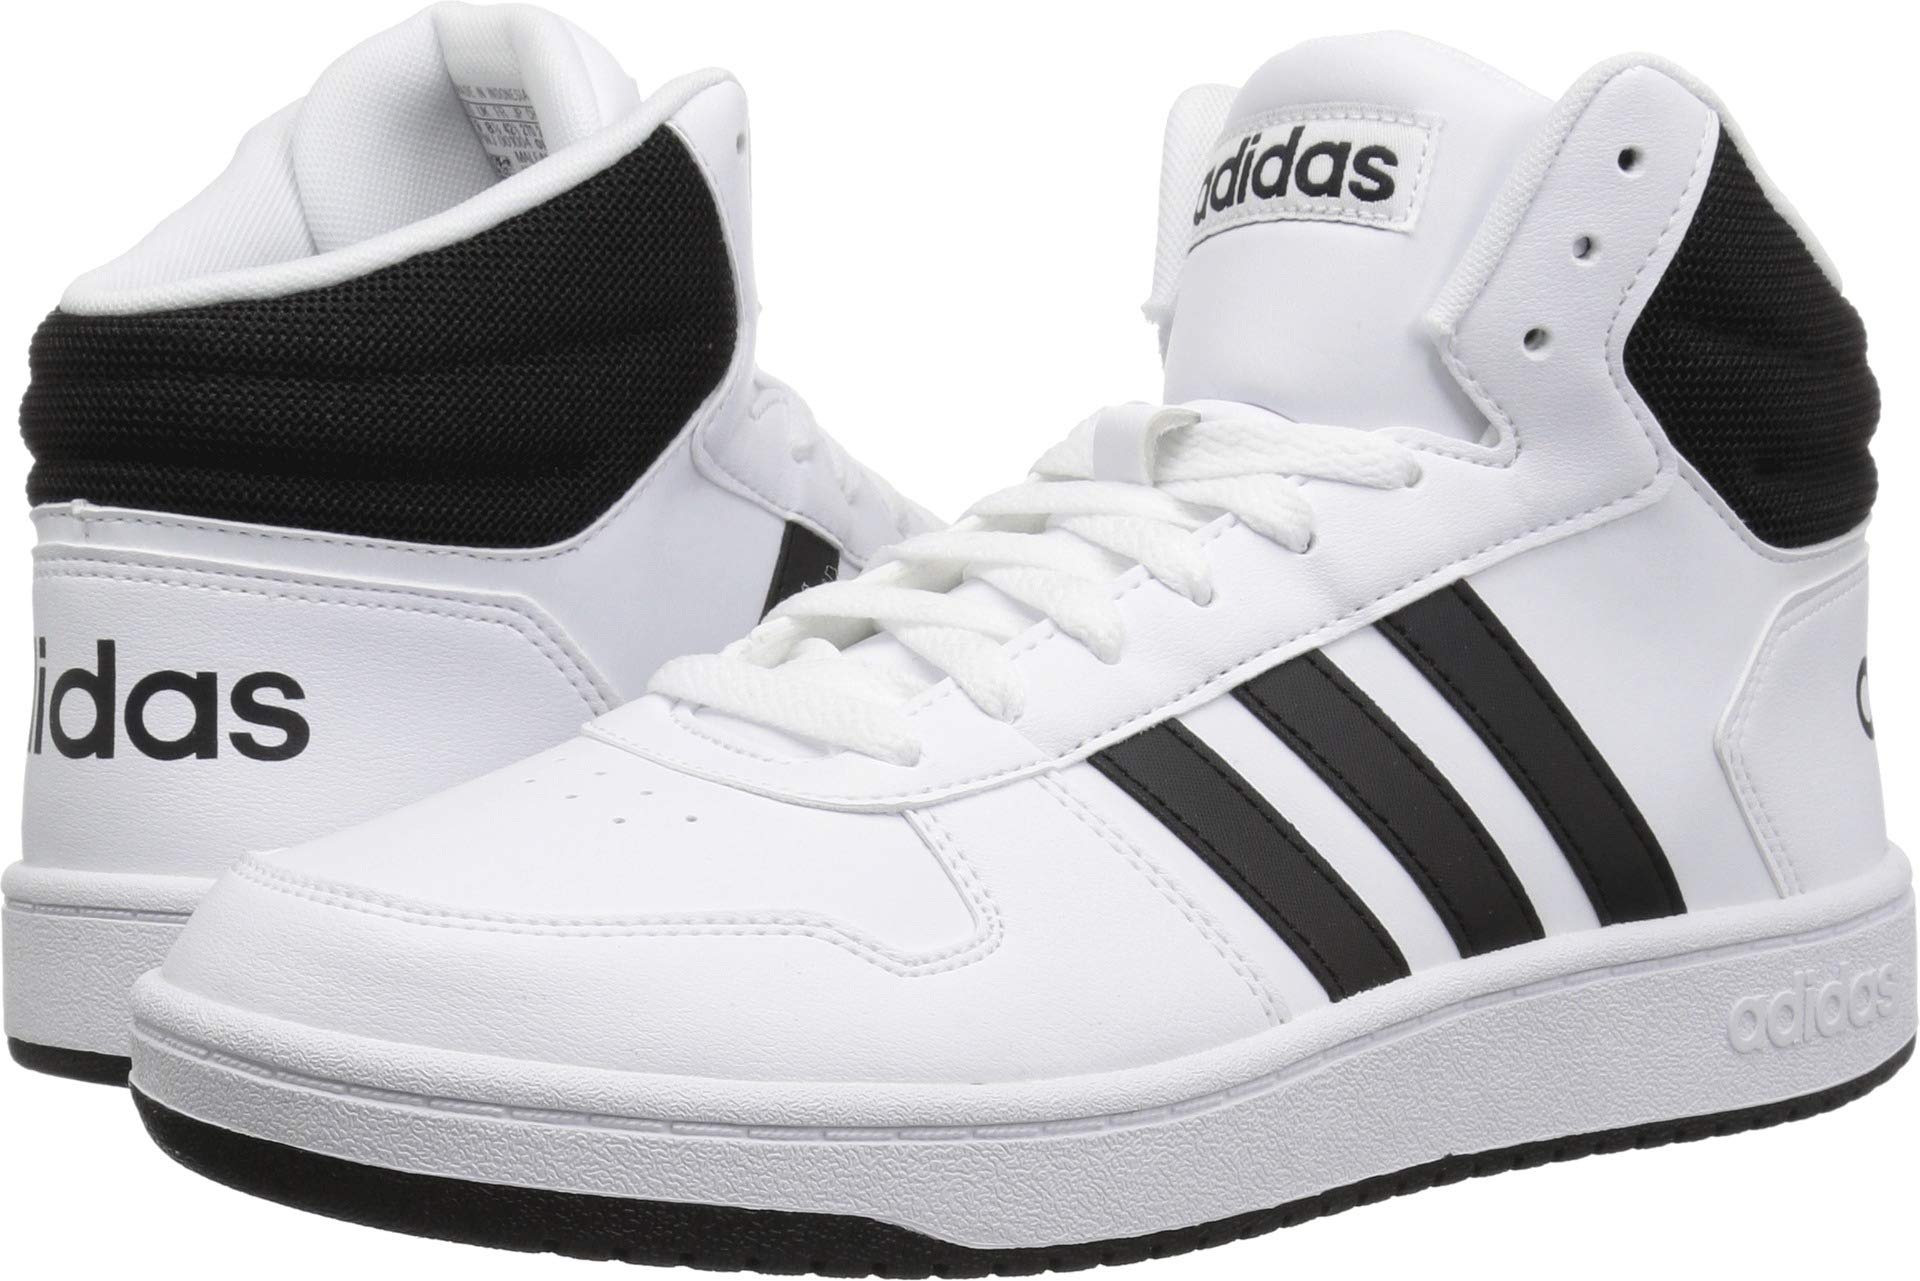 adidas Men's Hoops 2.0 Sneaker, White Black, 11 M US by adidas